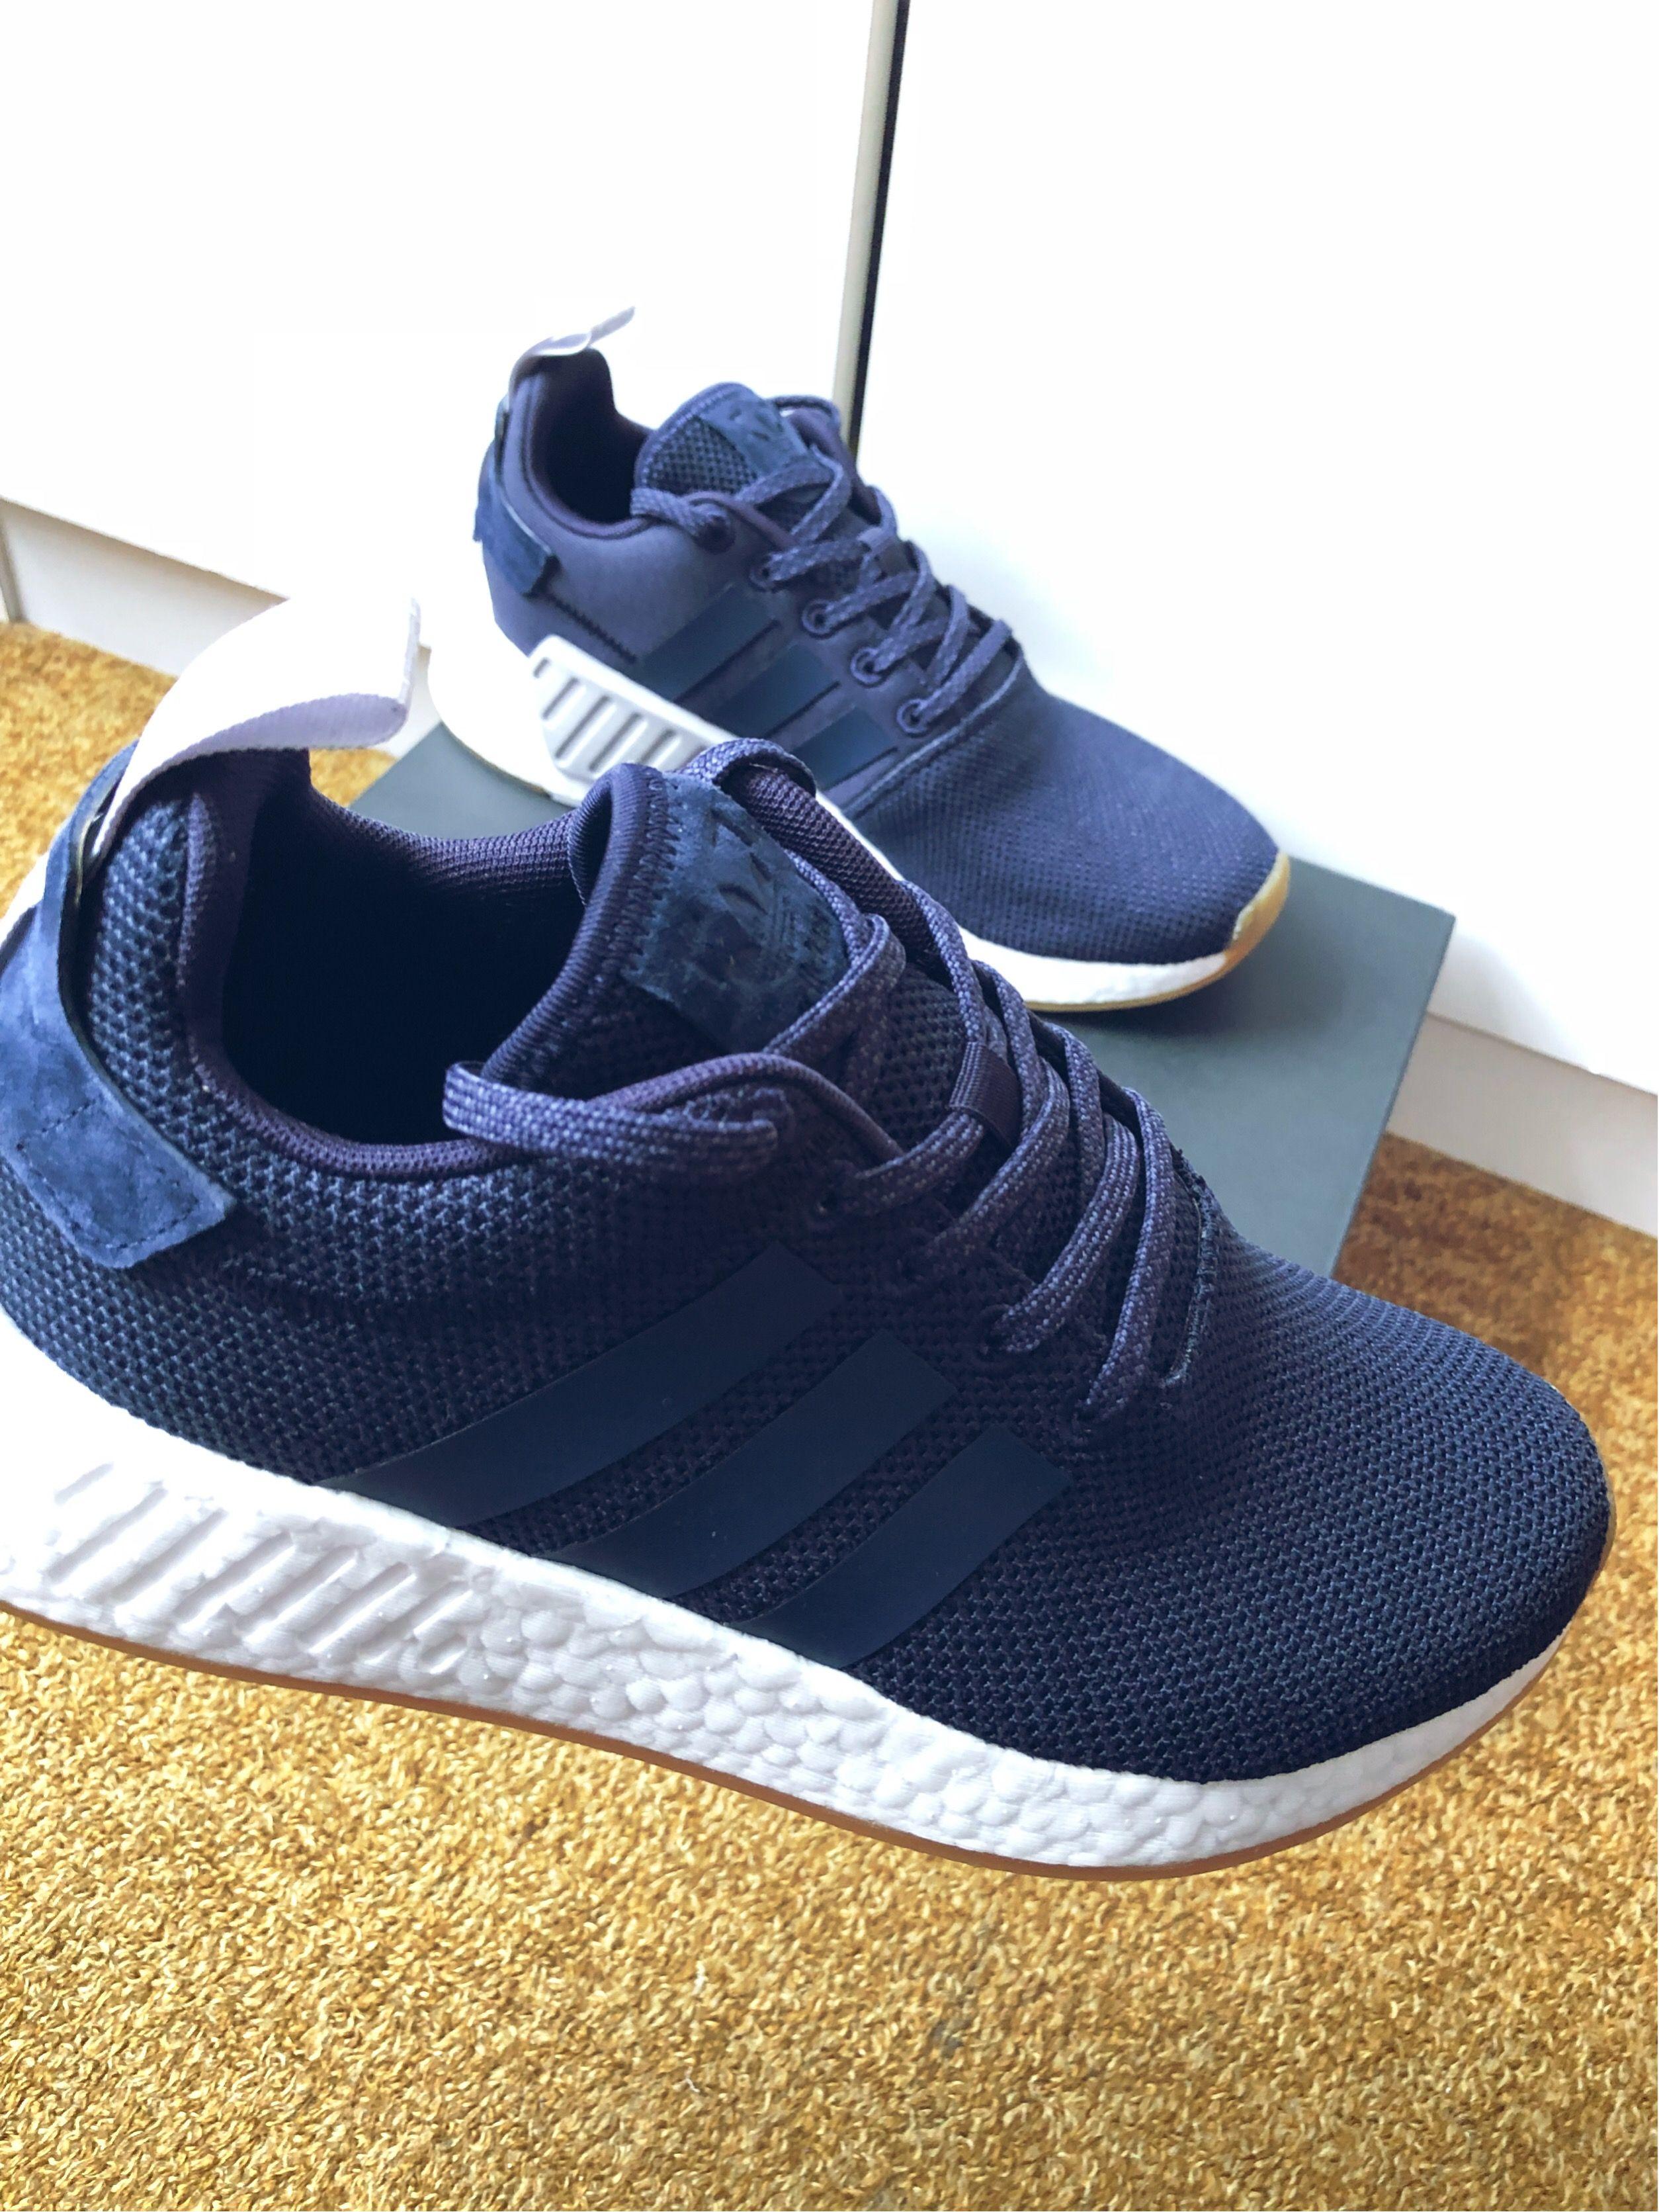 adidas Originals NMD_R2 | Sneakers fashion, Adidas